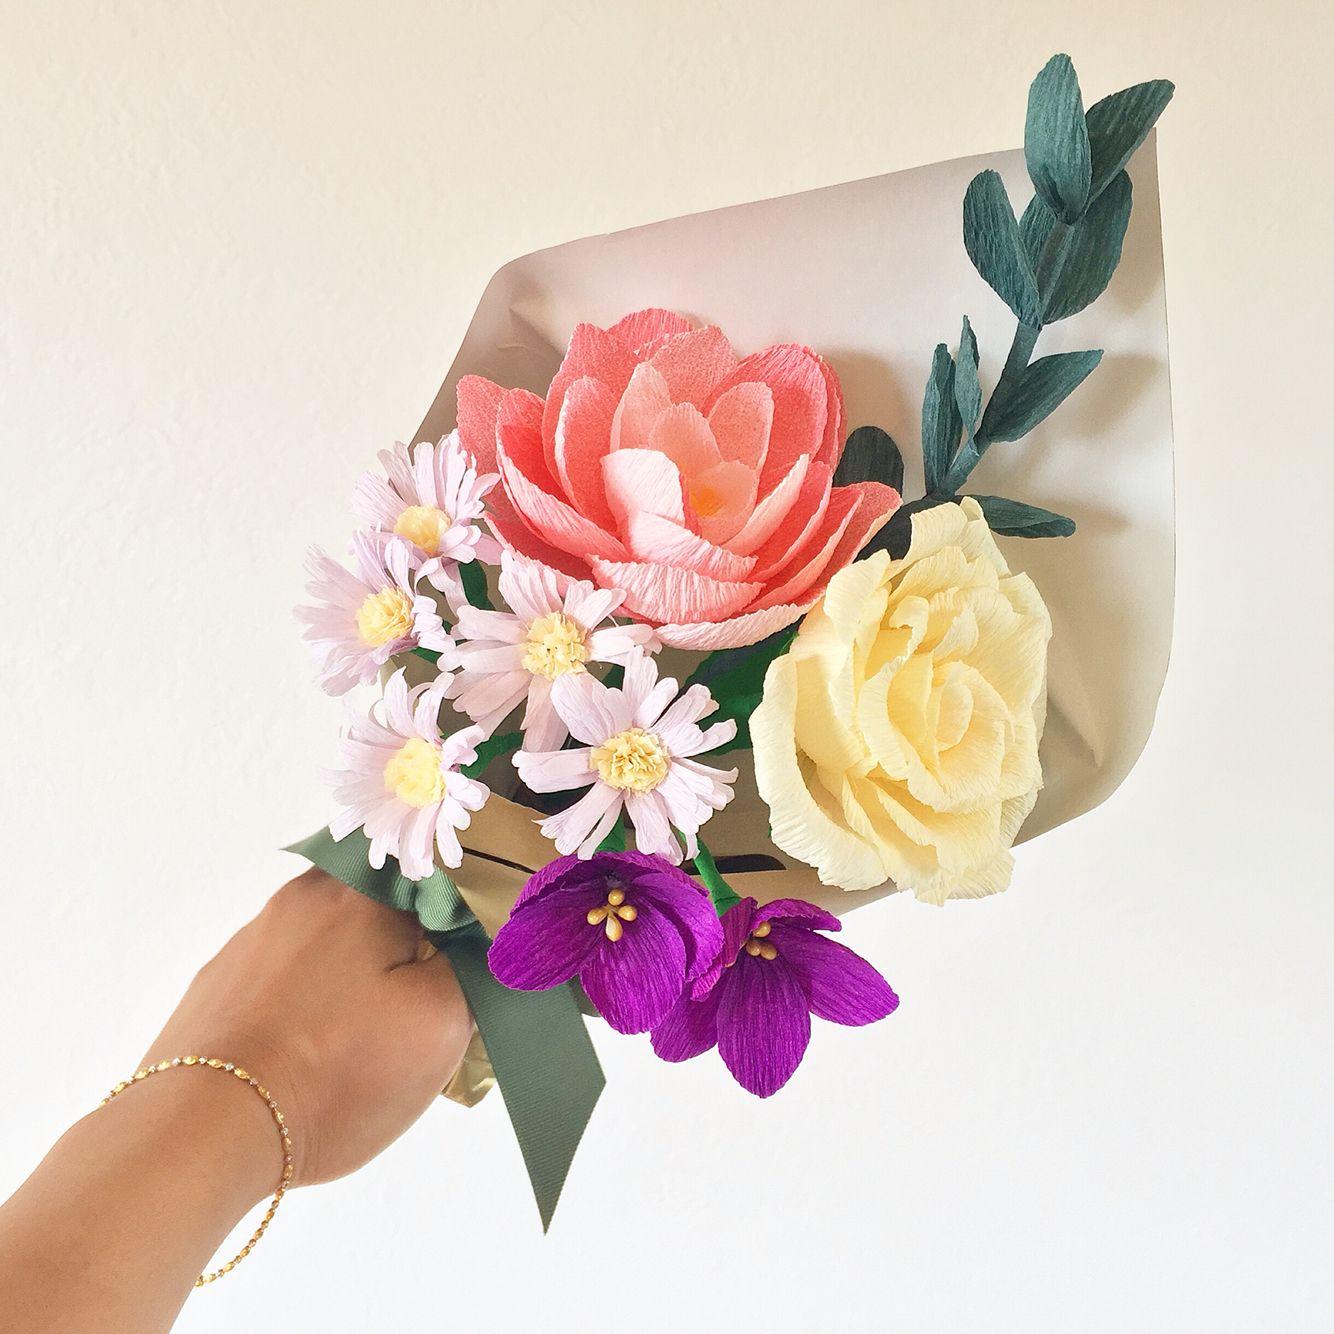 Crepe paper flowers bouquet of violets, daisies, camellia, rose ...